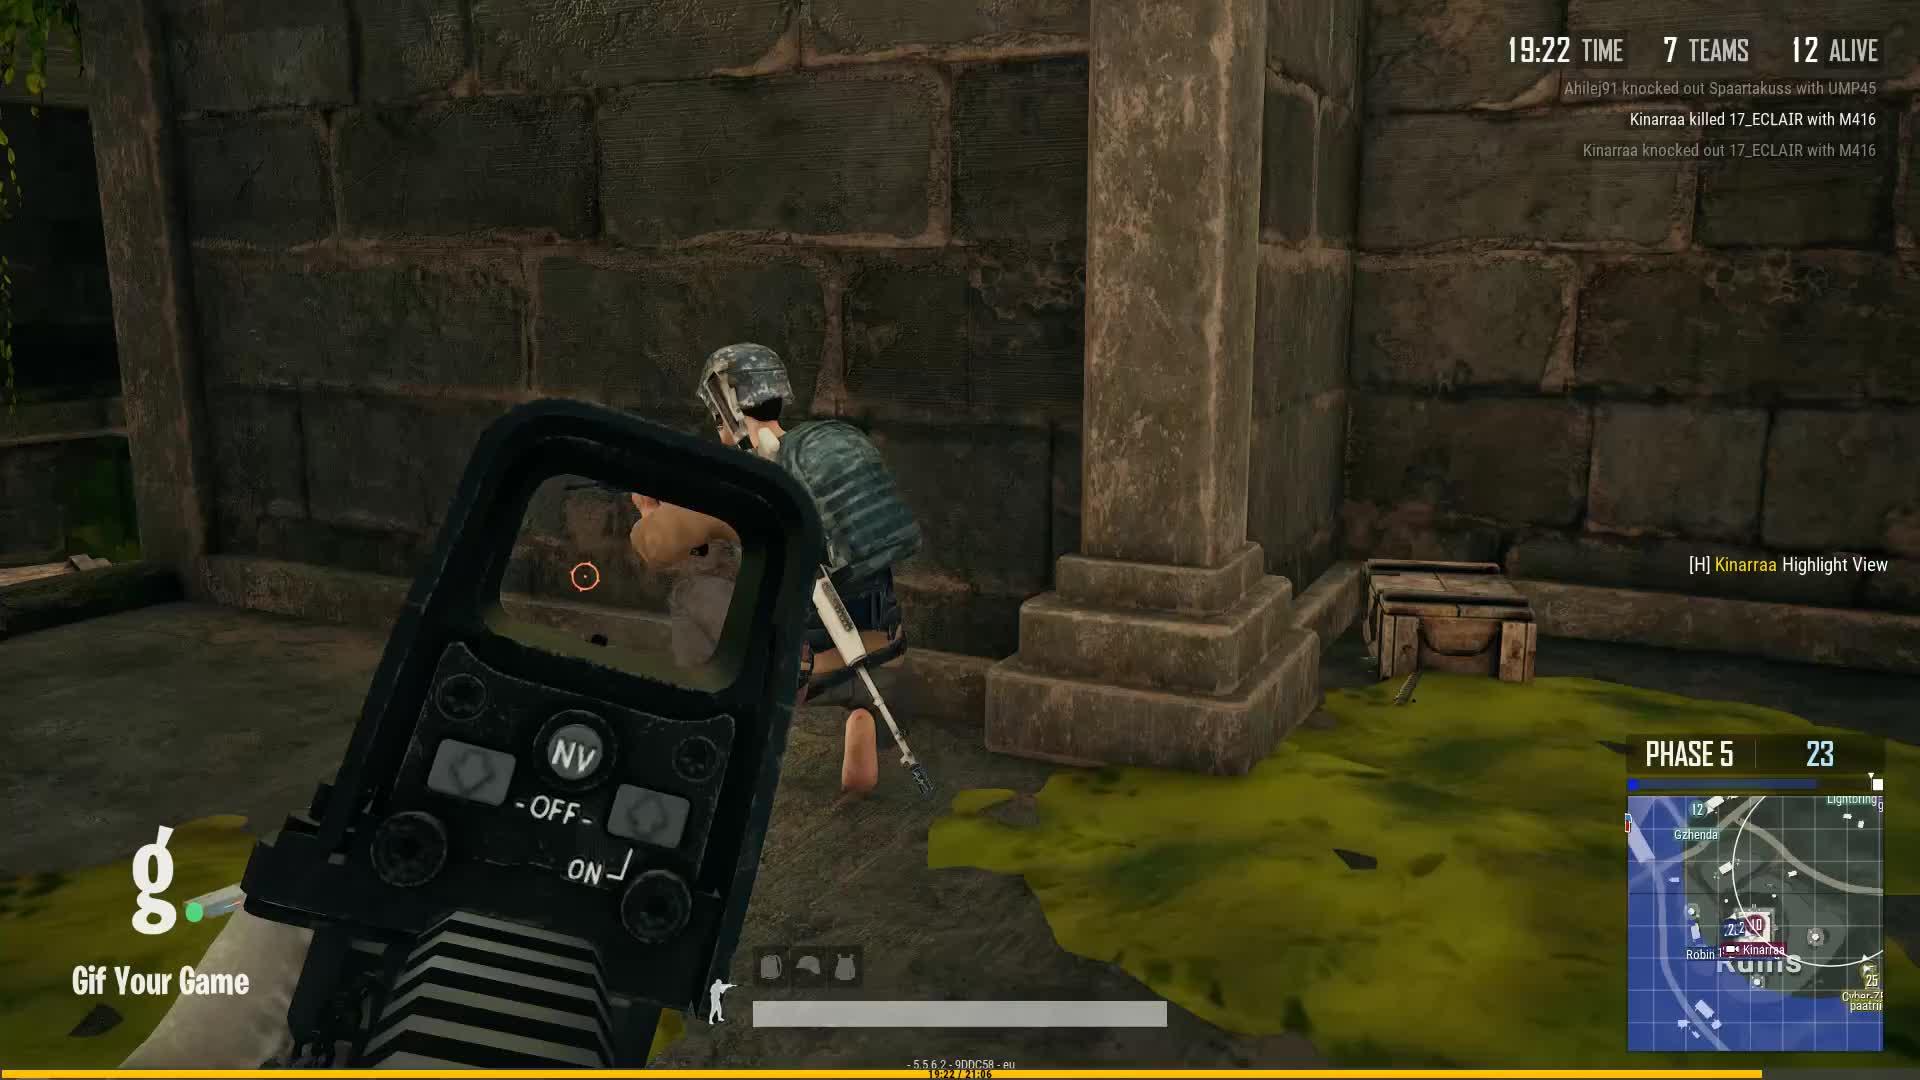 Gaming, Gif Your Game, GifYourGame, Kill, Kinarraa, PUBG, PUBattlegrounds, ⏱️ Kinarraa killed Bullseye2191 GIFs